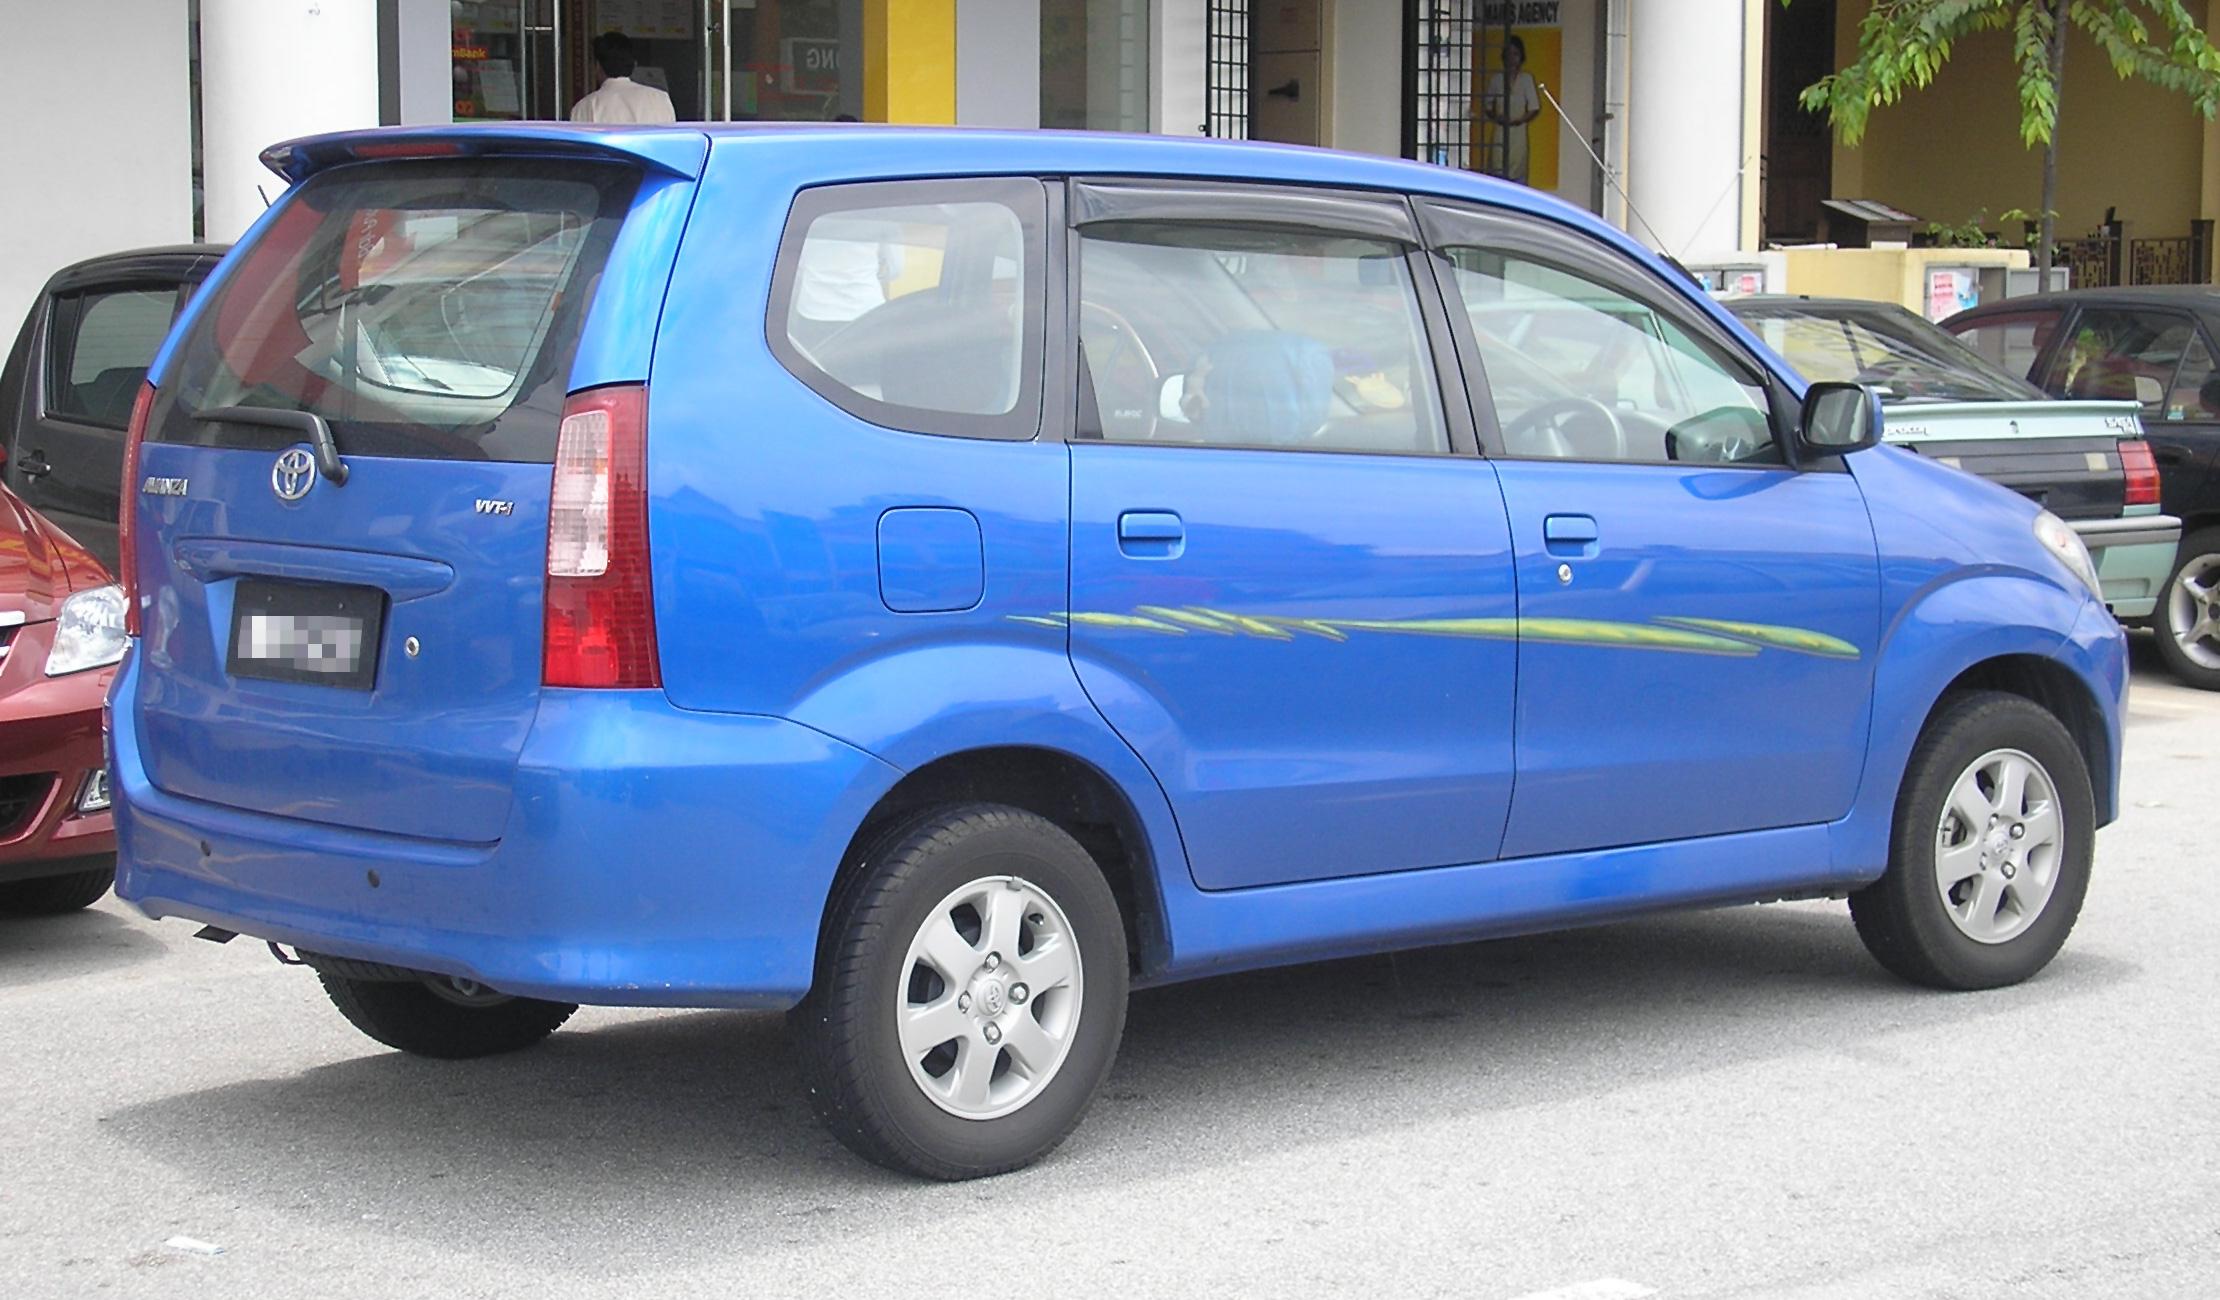 Chr Toyota Price Malaysia >> Toyota avanza colors malaysia